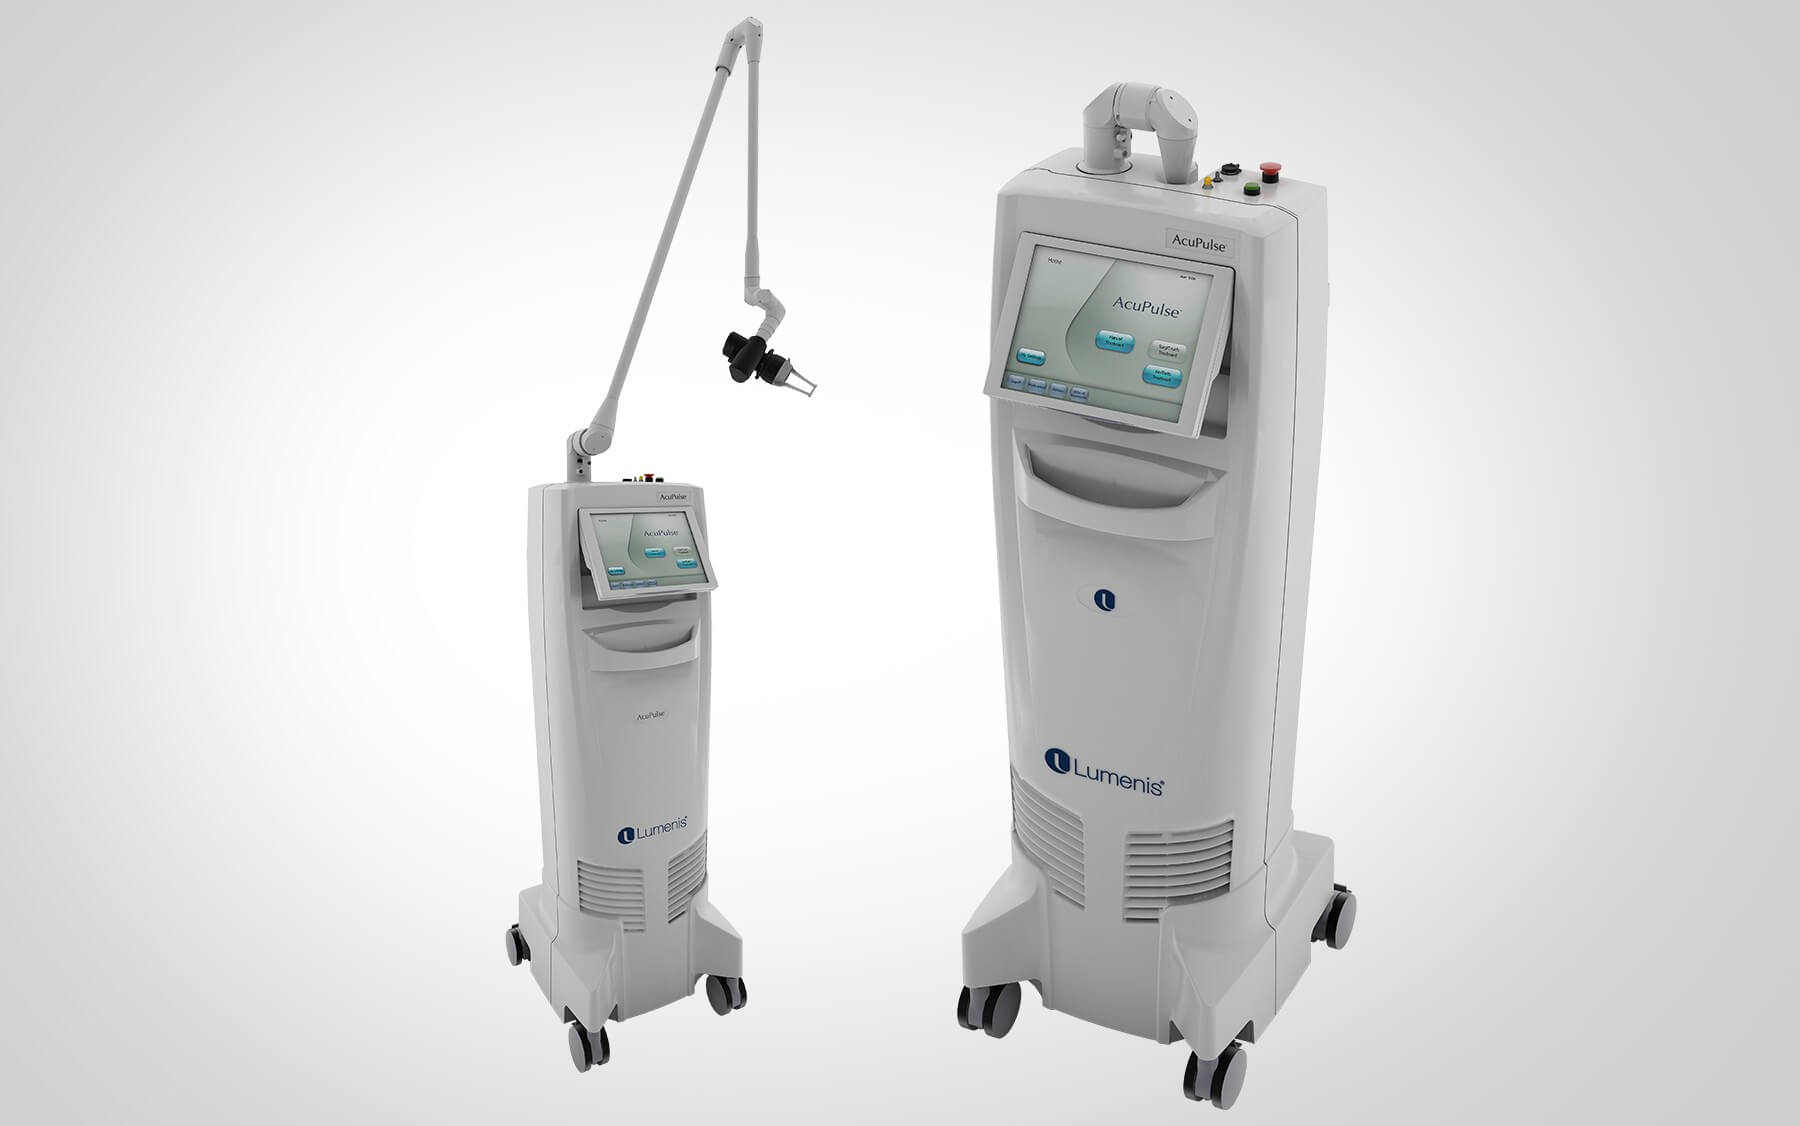 equipos foto portada lumenis acupulse1 - Lumenis Acupulse CO2